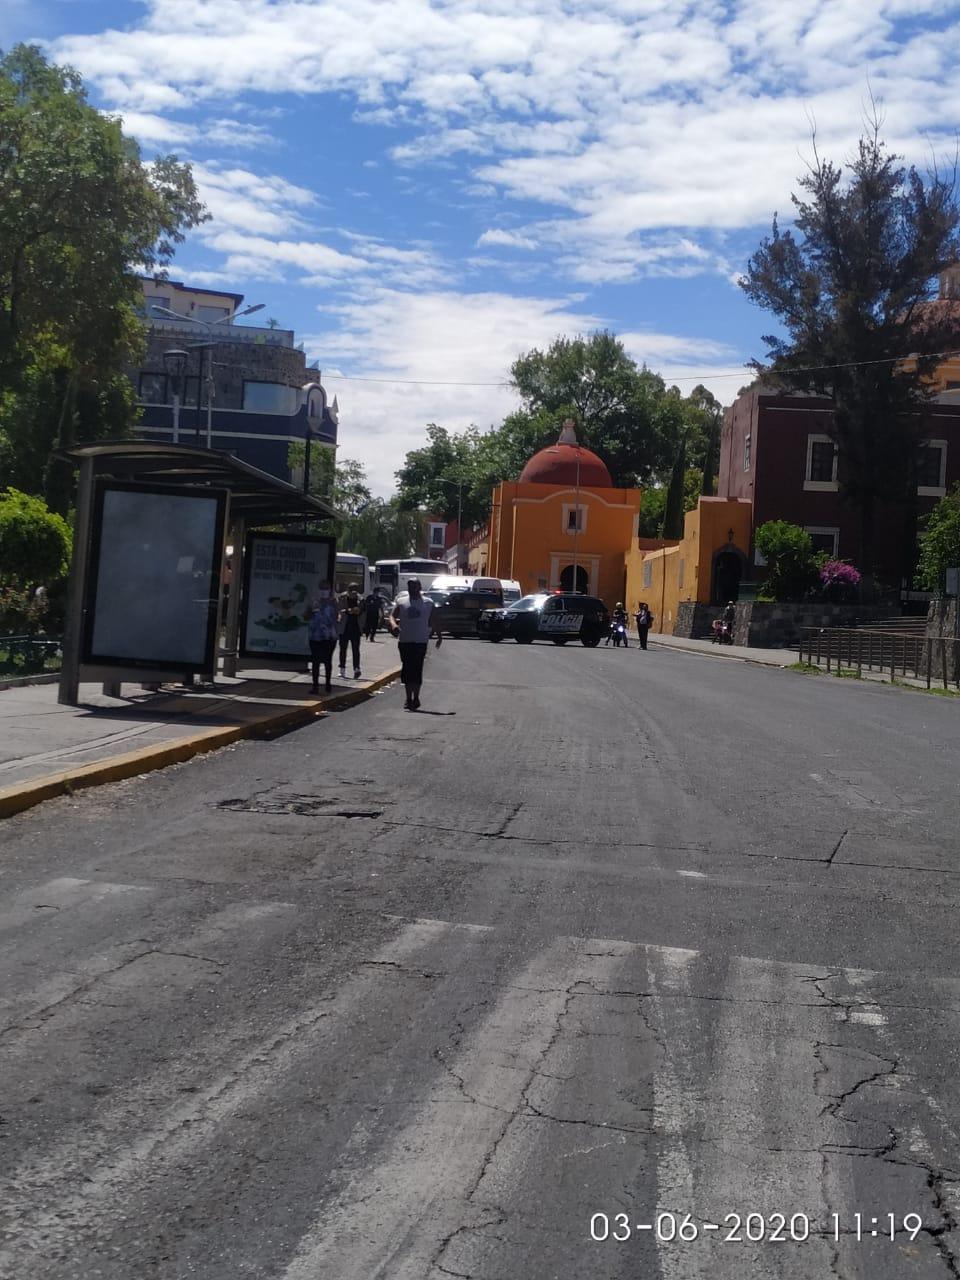 Policías estatales marchan por segundo día seguido